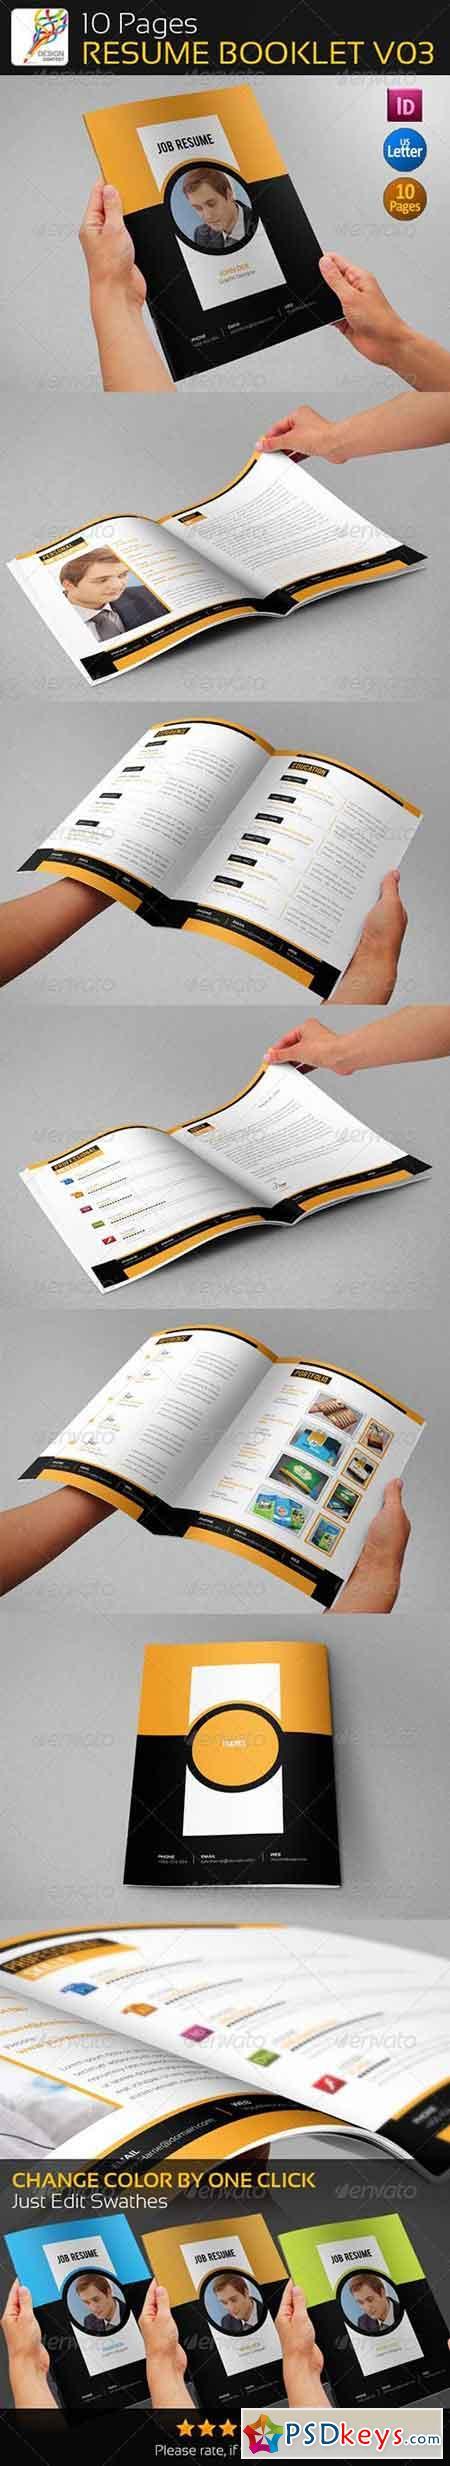 Booklet » Free Download Photoshop Vector Stock image Via Torrent ...